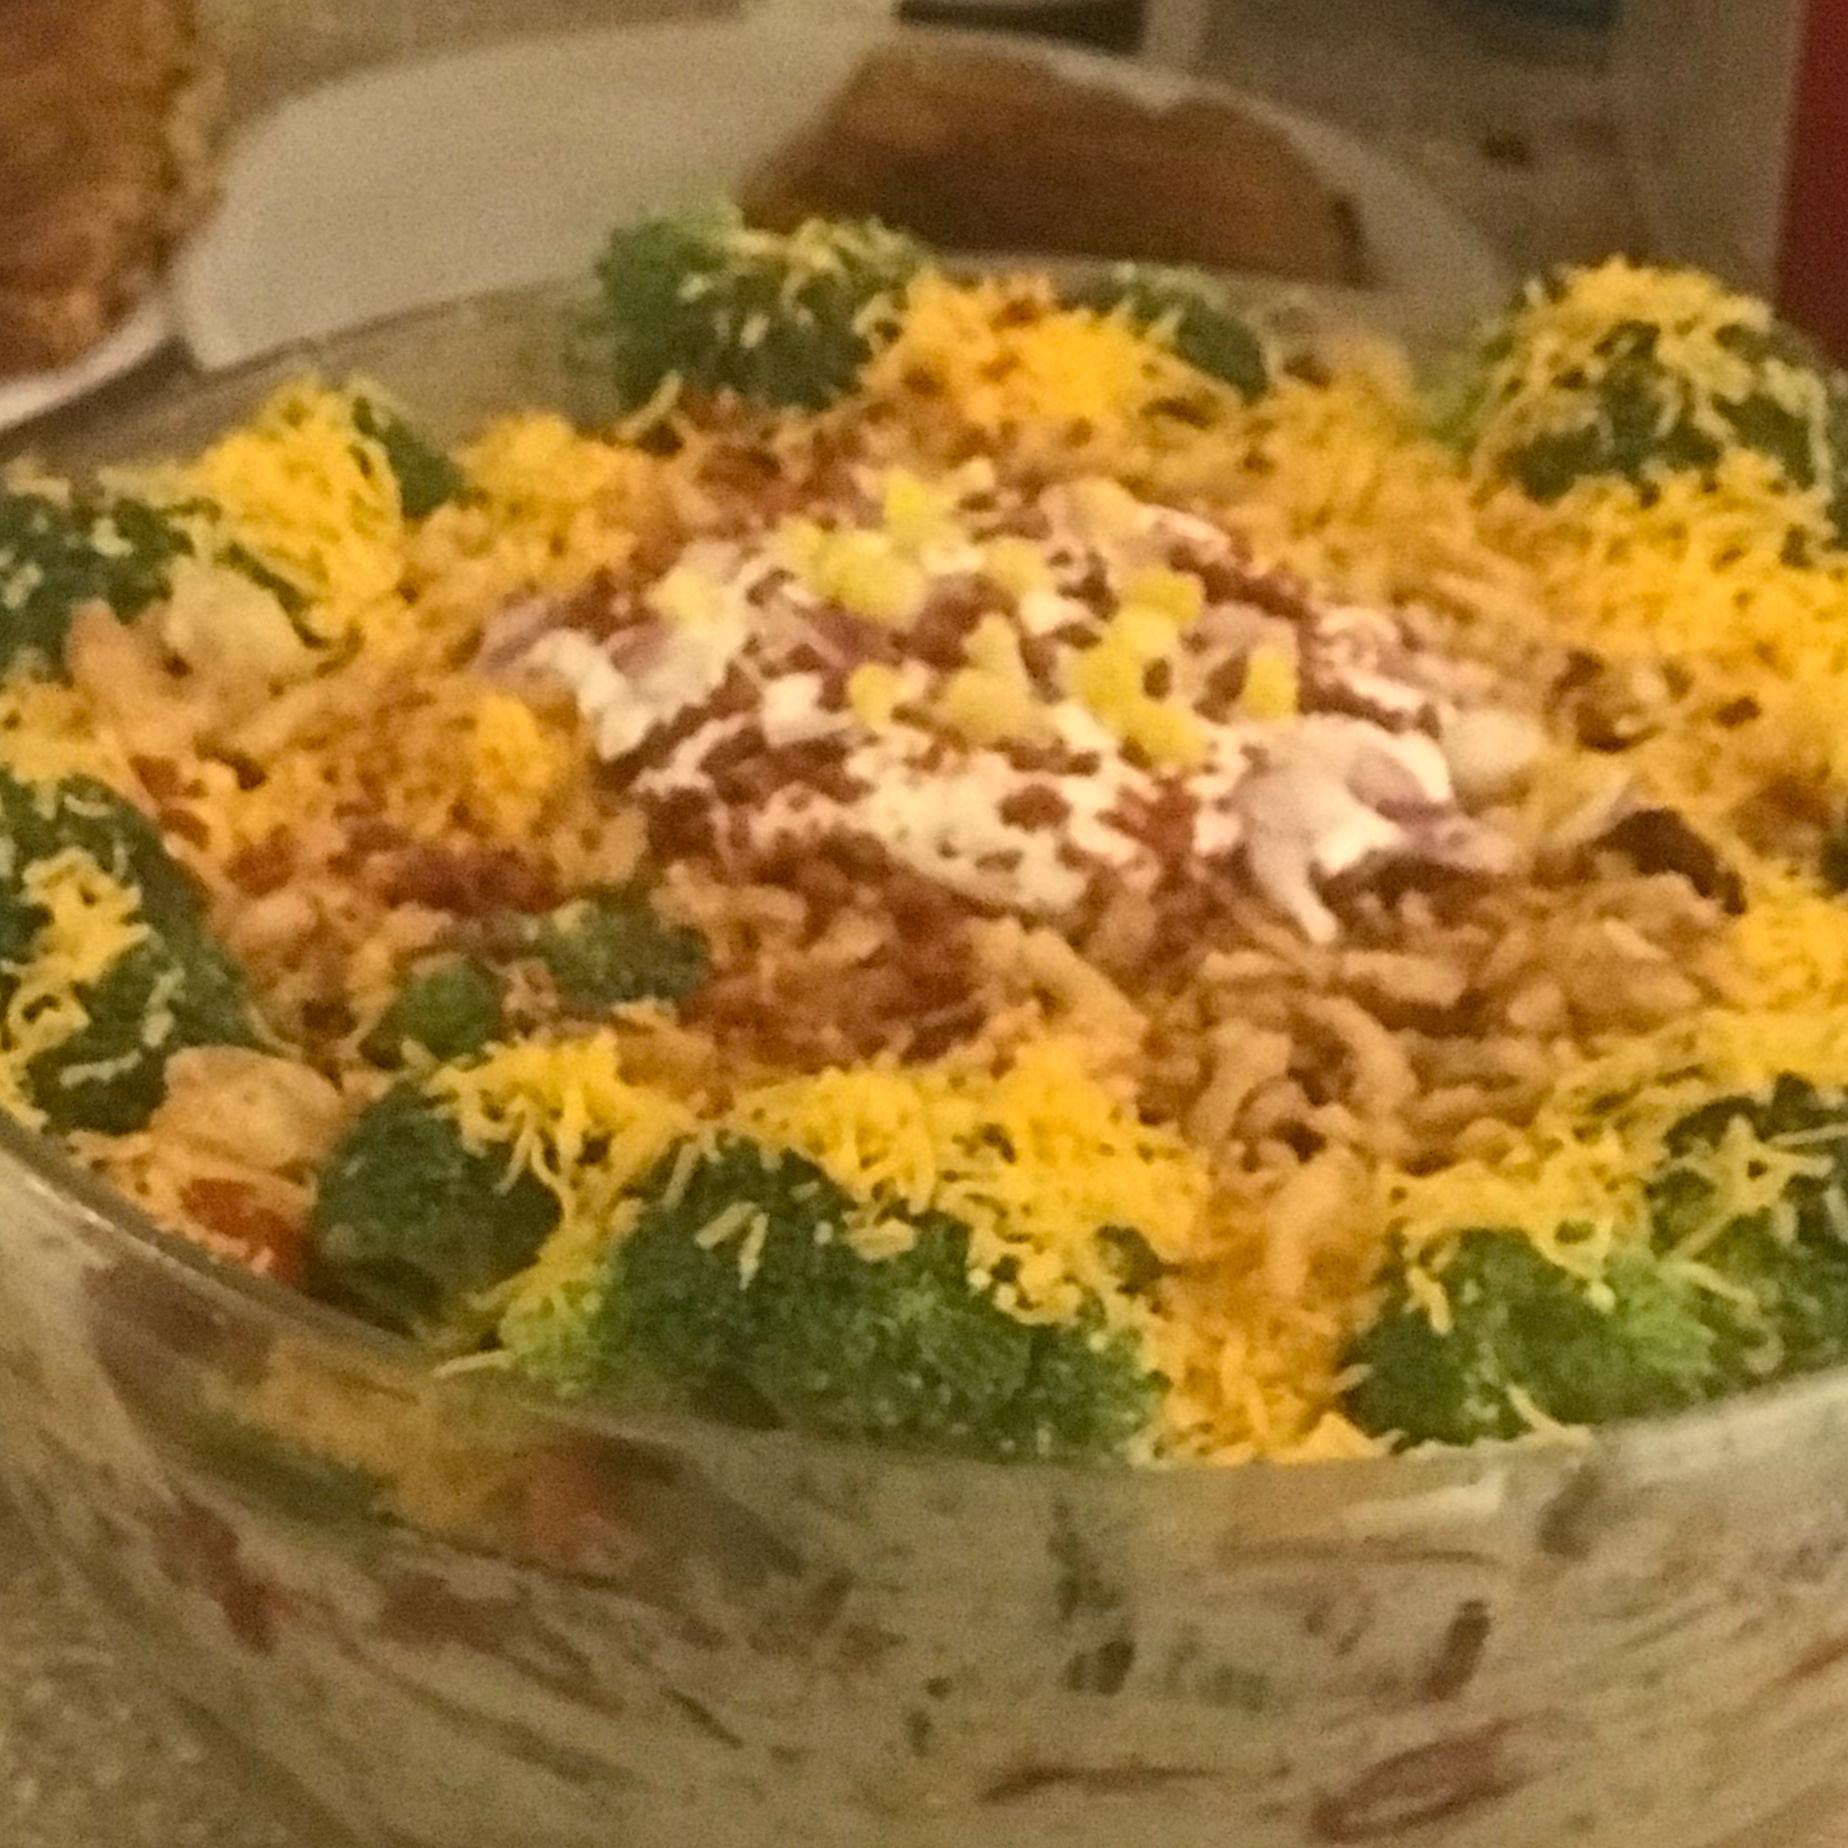 Mexican Cornbread Salad Sarah Judah- Israel